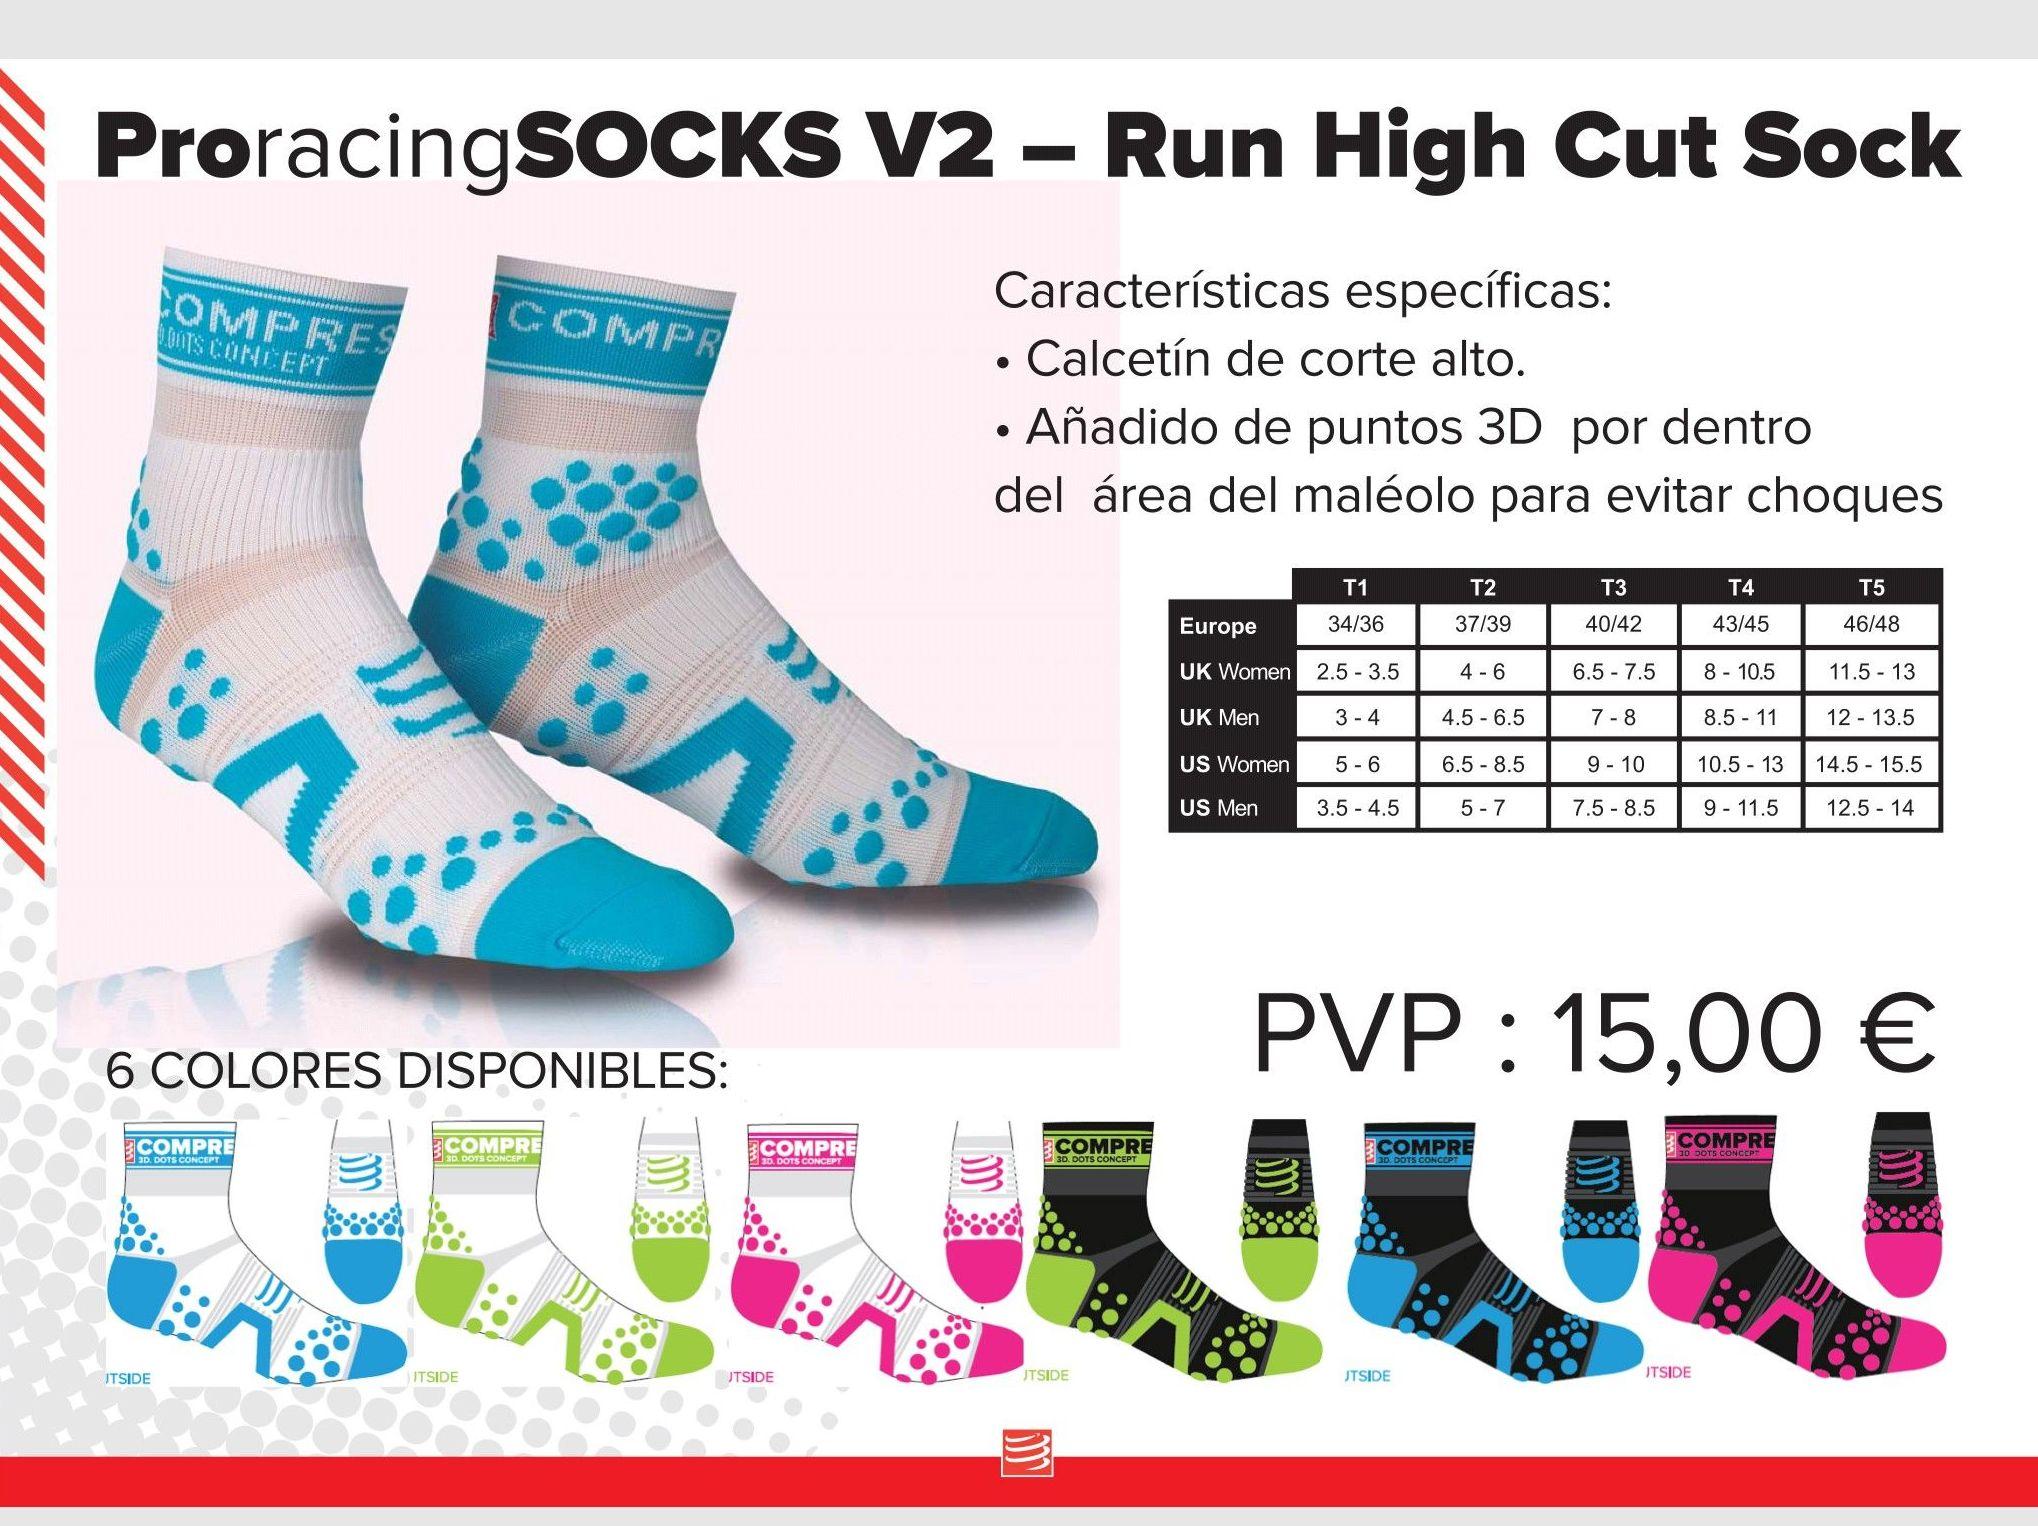 Pro racing Socks V2 Run High Cut Sock: TIENDA ONLINE de Ortopedia La Fama